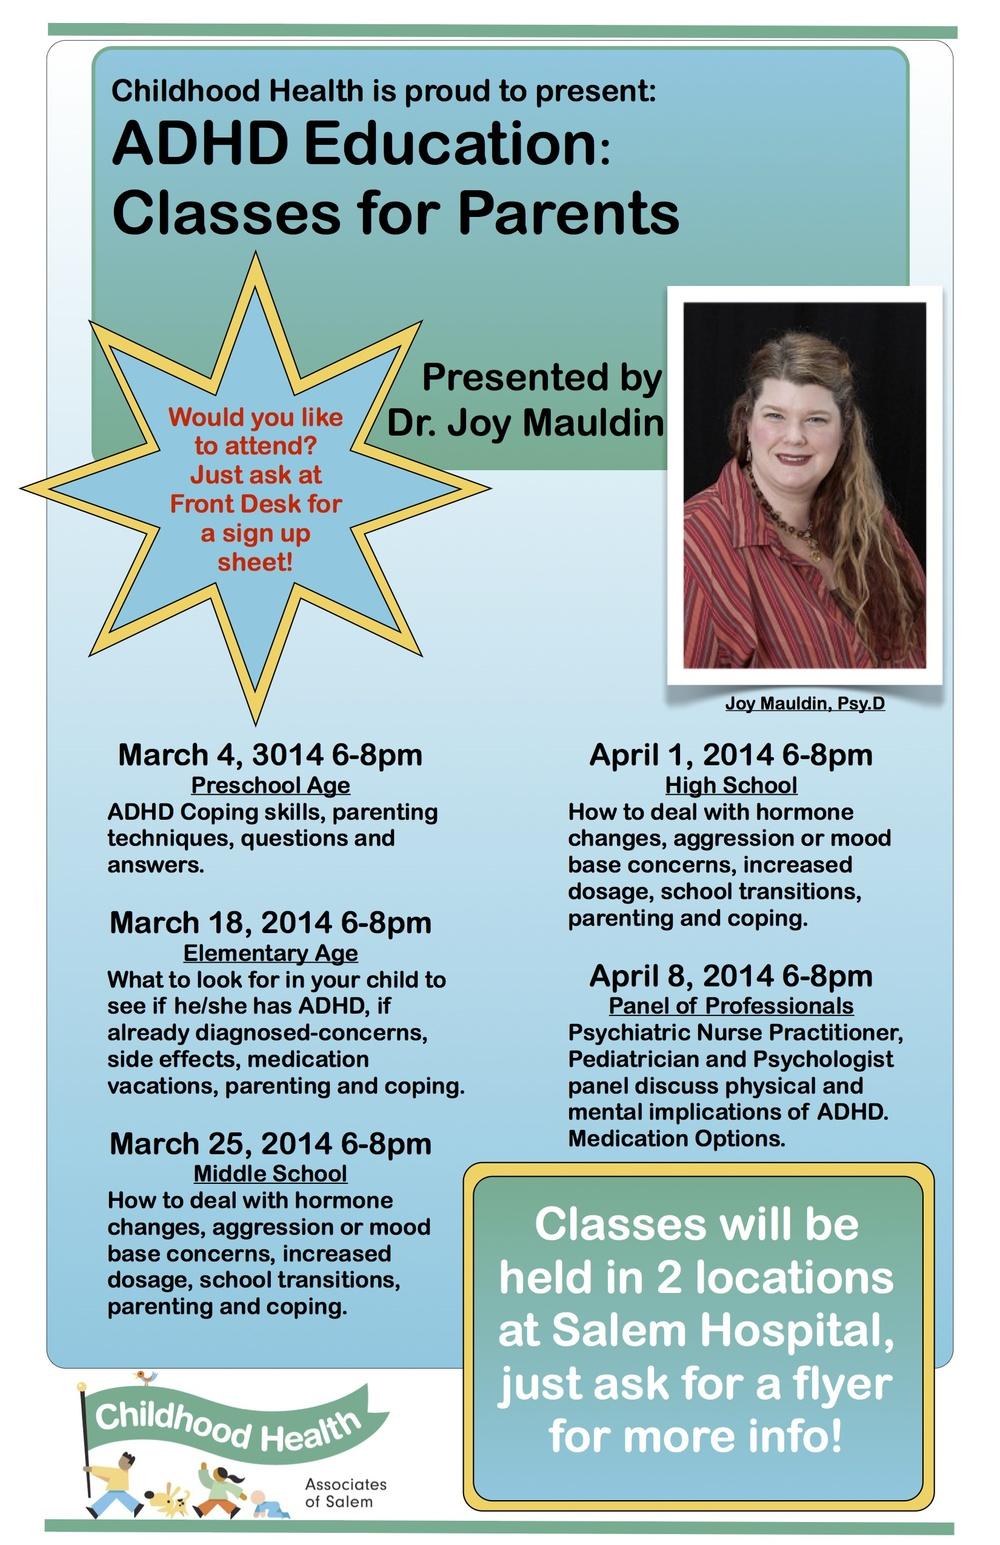 ADHD Poster announcing Classes At Salem Hospital.jpg